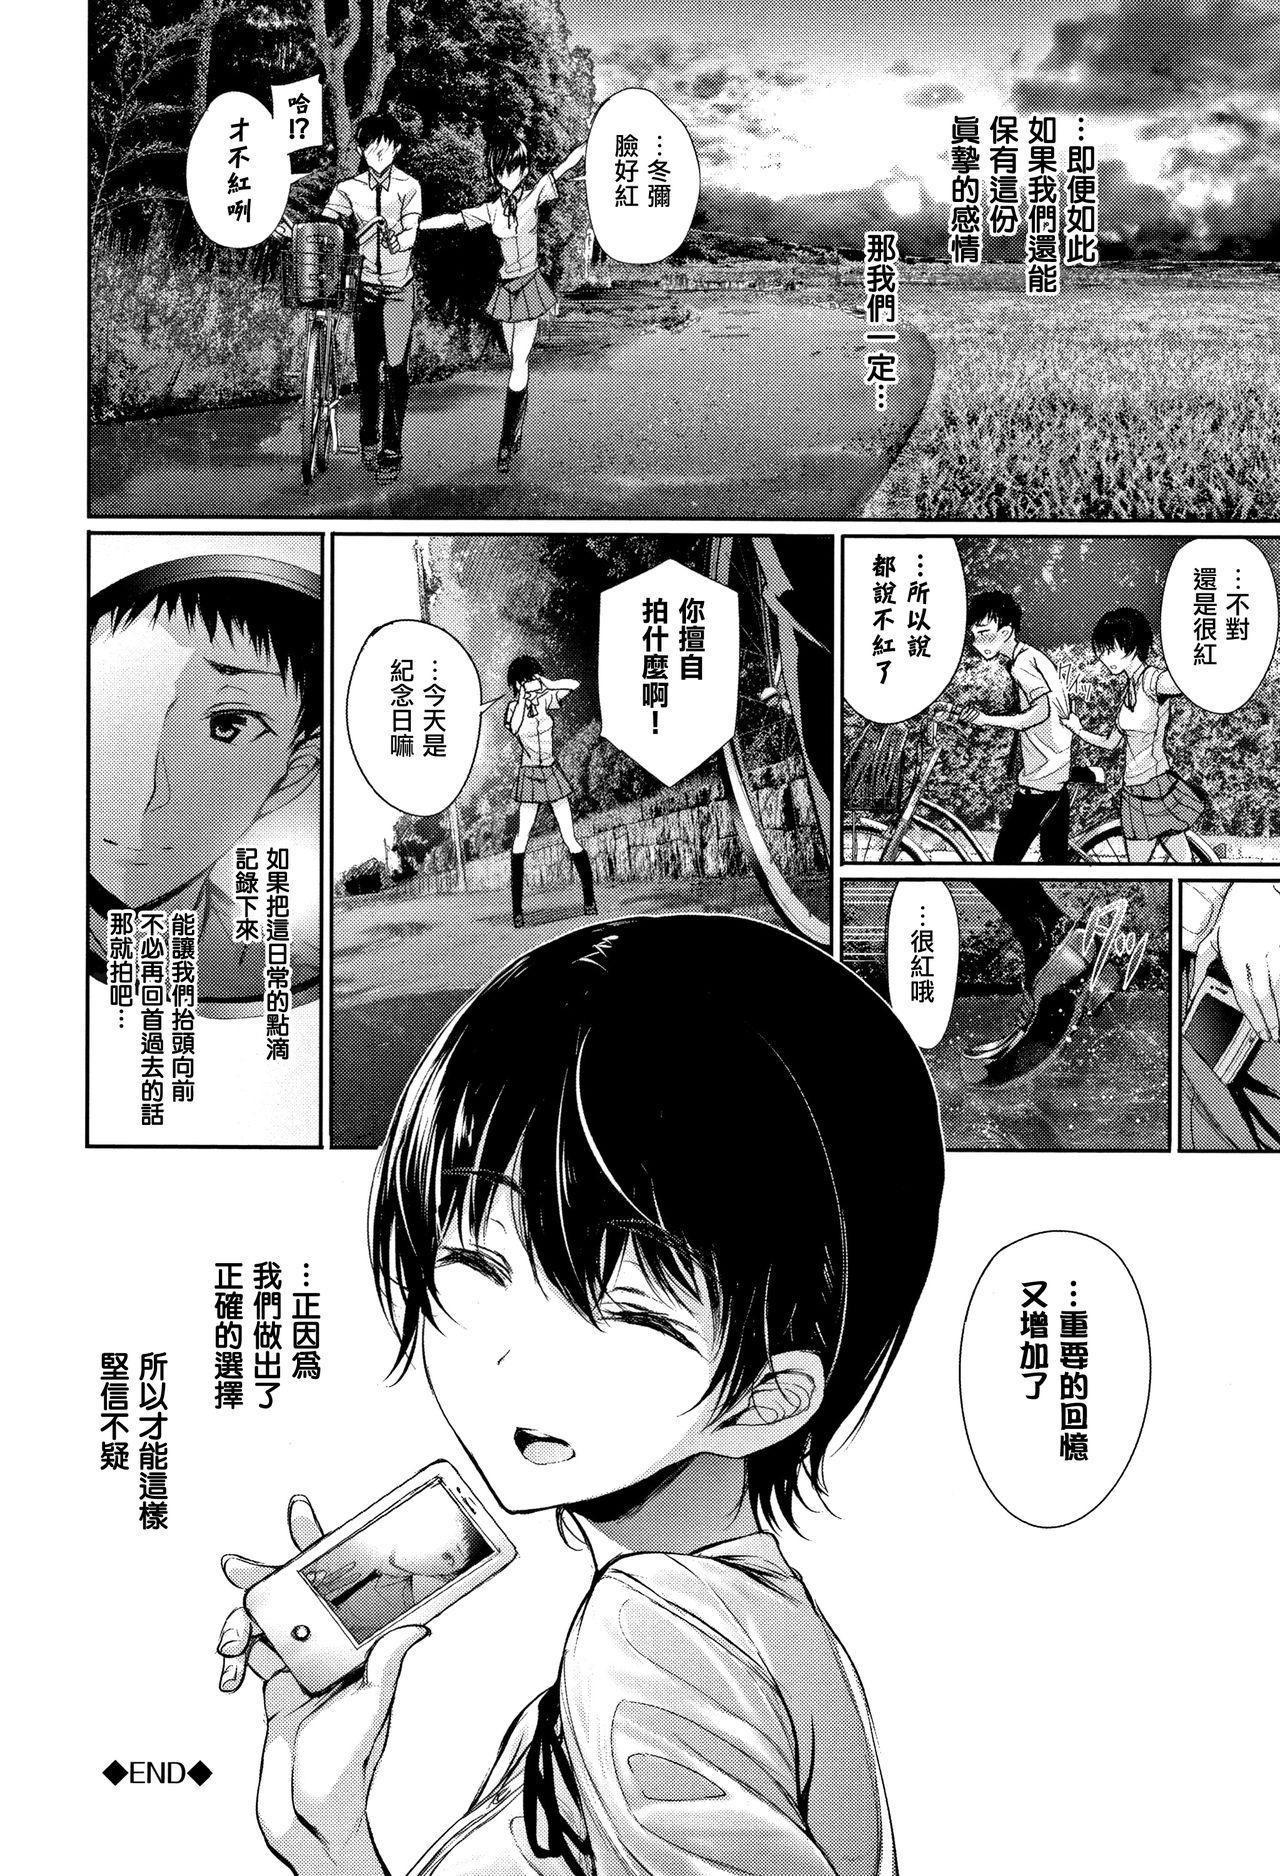 [Gentsuki] Kimi Omou Koi - I think of you. Ch. 1-7 [Chinese] [无毒汉化组] 48